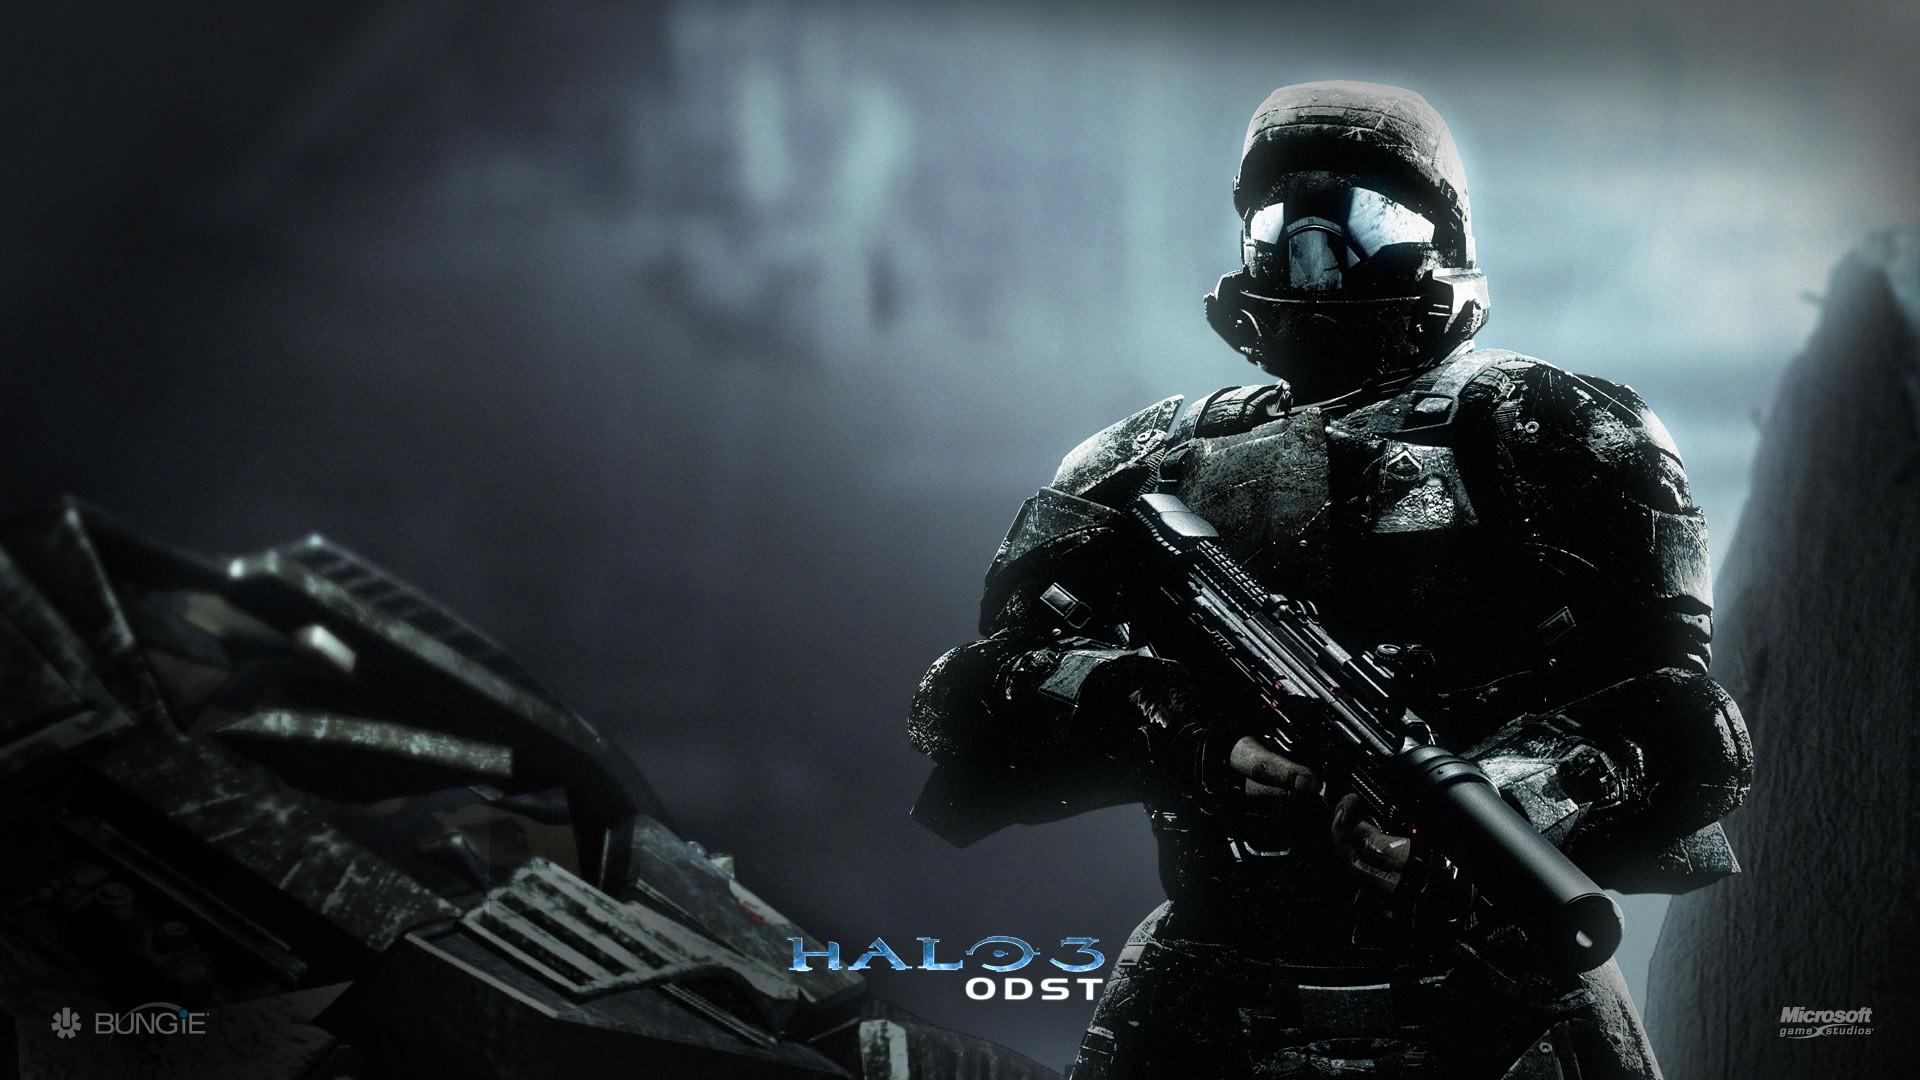 1920x1080 Halo 4 Live Wallpaper